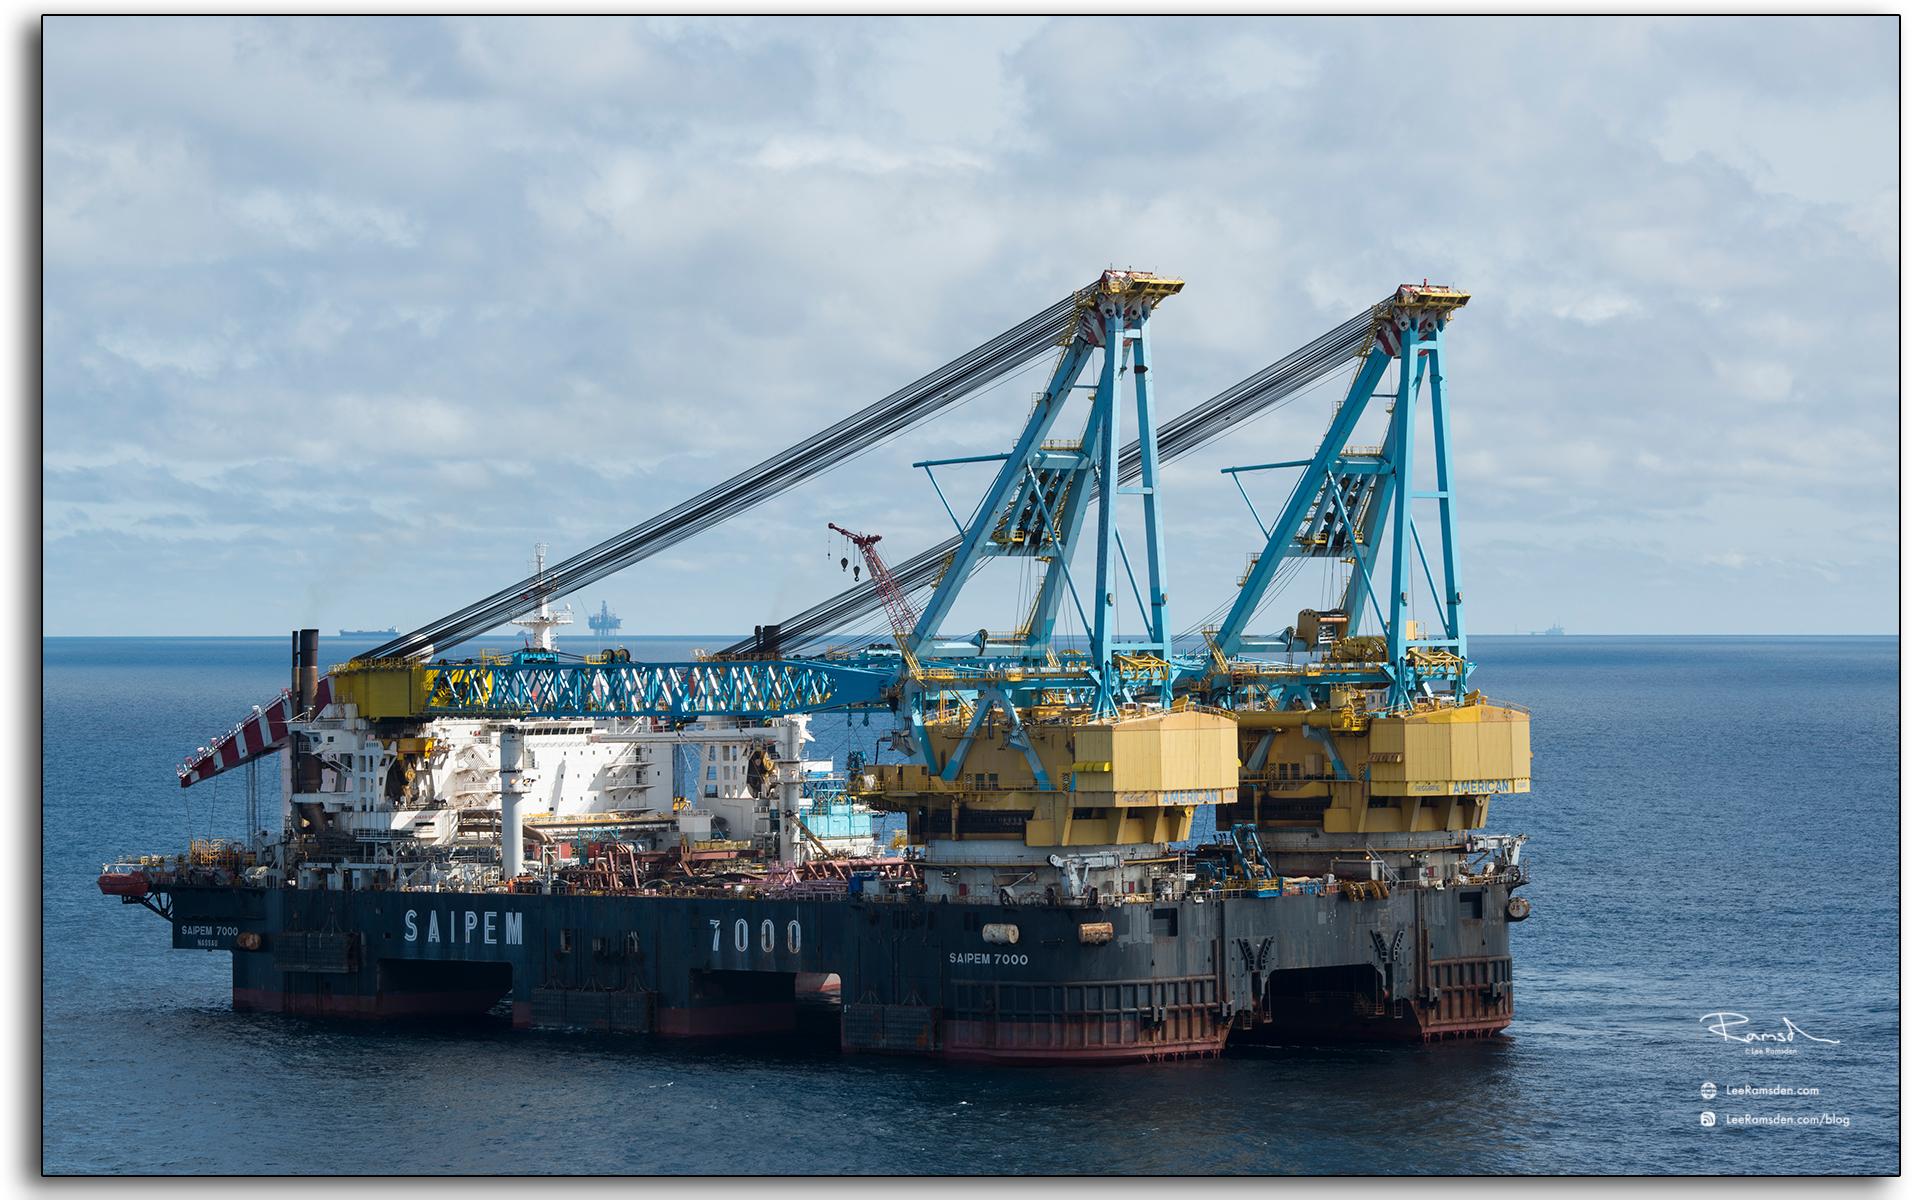 S7000 north sea, lifting vessel, Saipem, italian